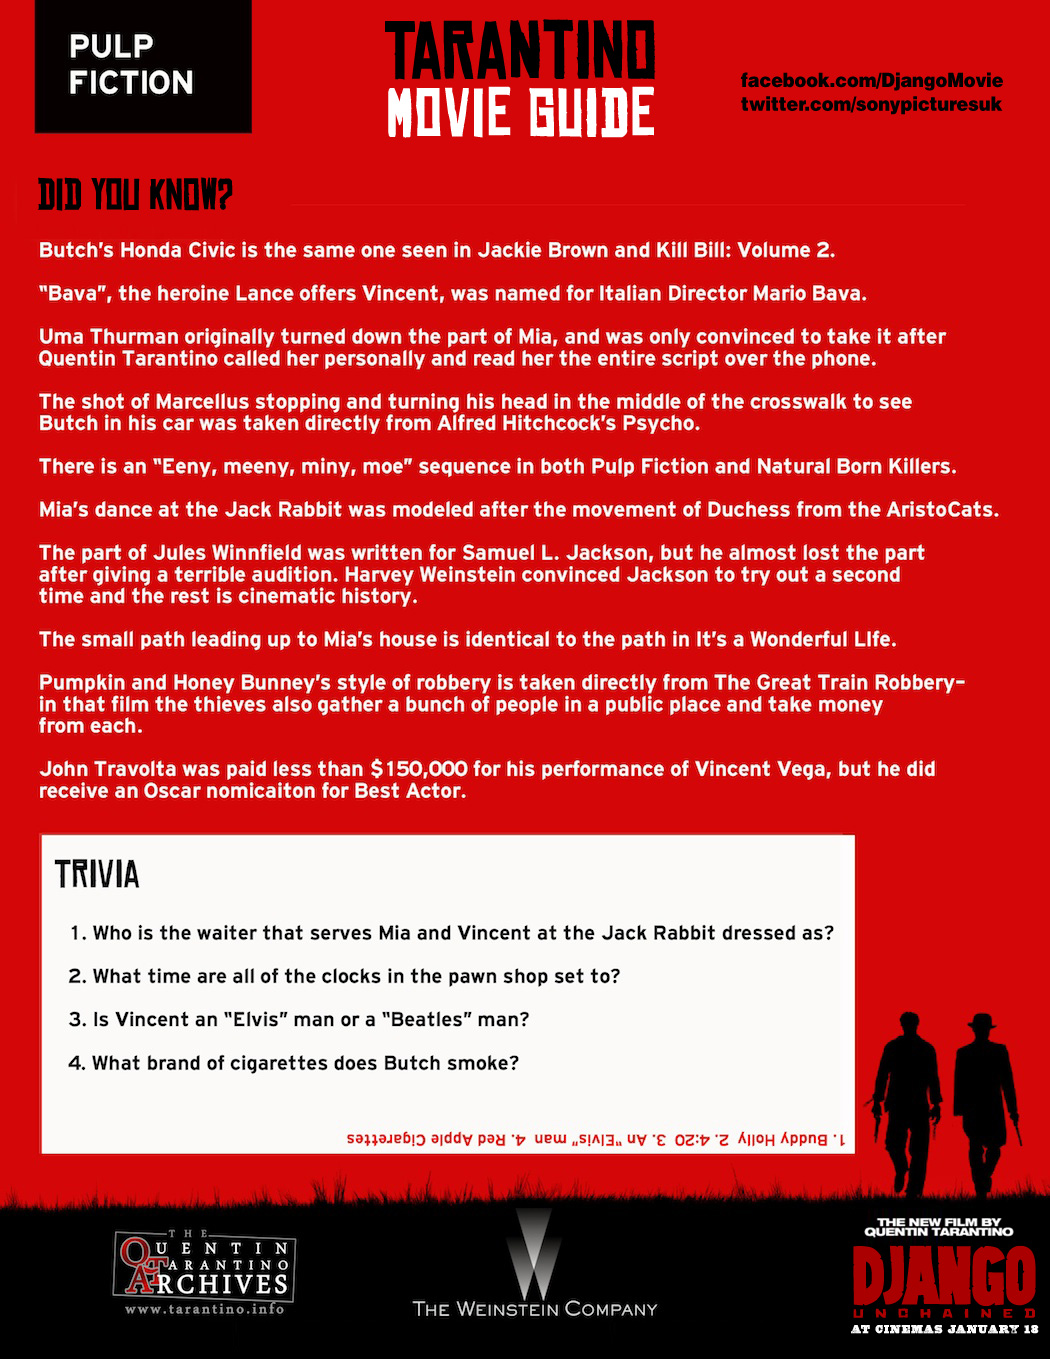 Tarantino Movie Guide – Pulp Fiction